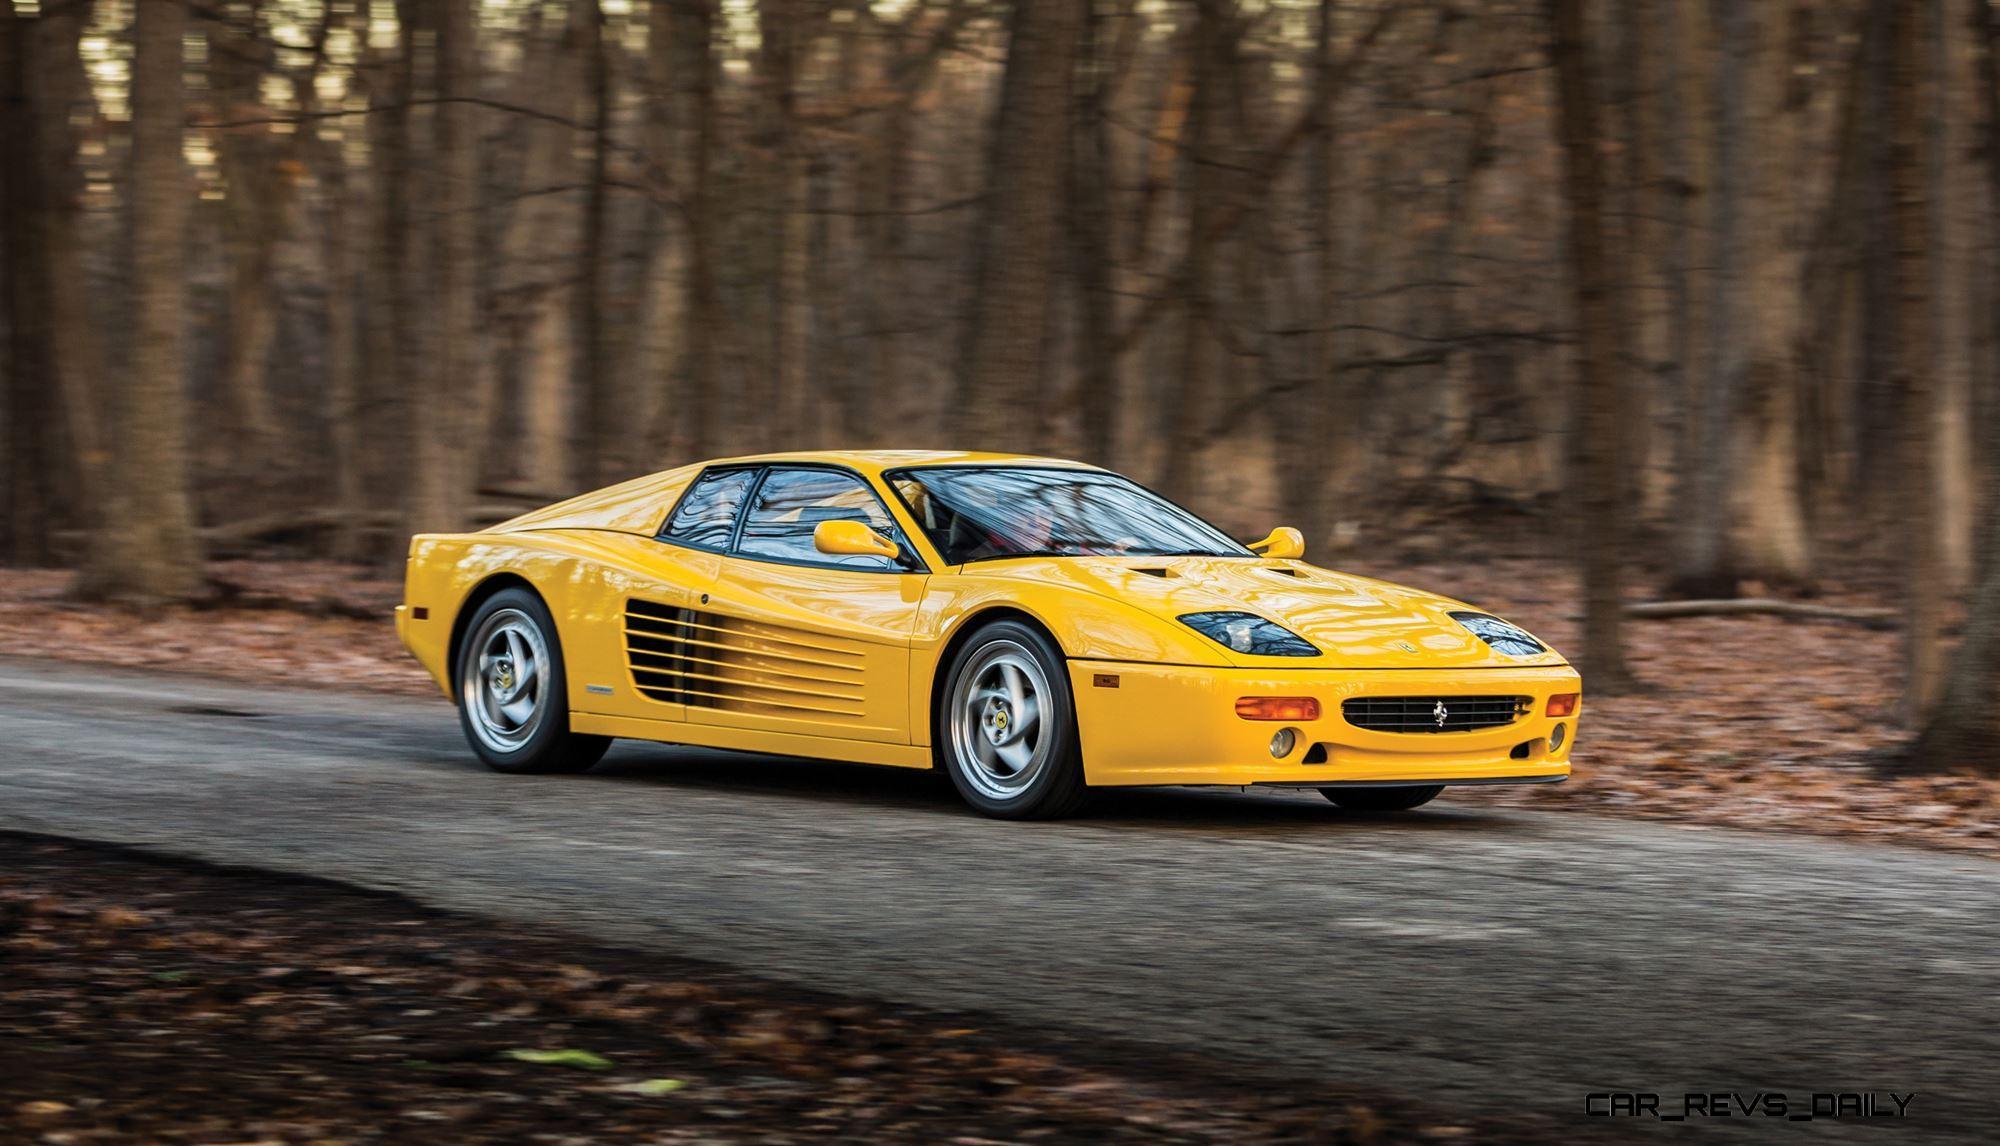 How To Flip Cars >> 1995 Ferrari F512 Modificata - Last Flat-12 Fezza Updated Testarossa Details for 1990s